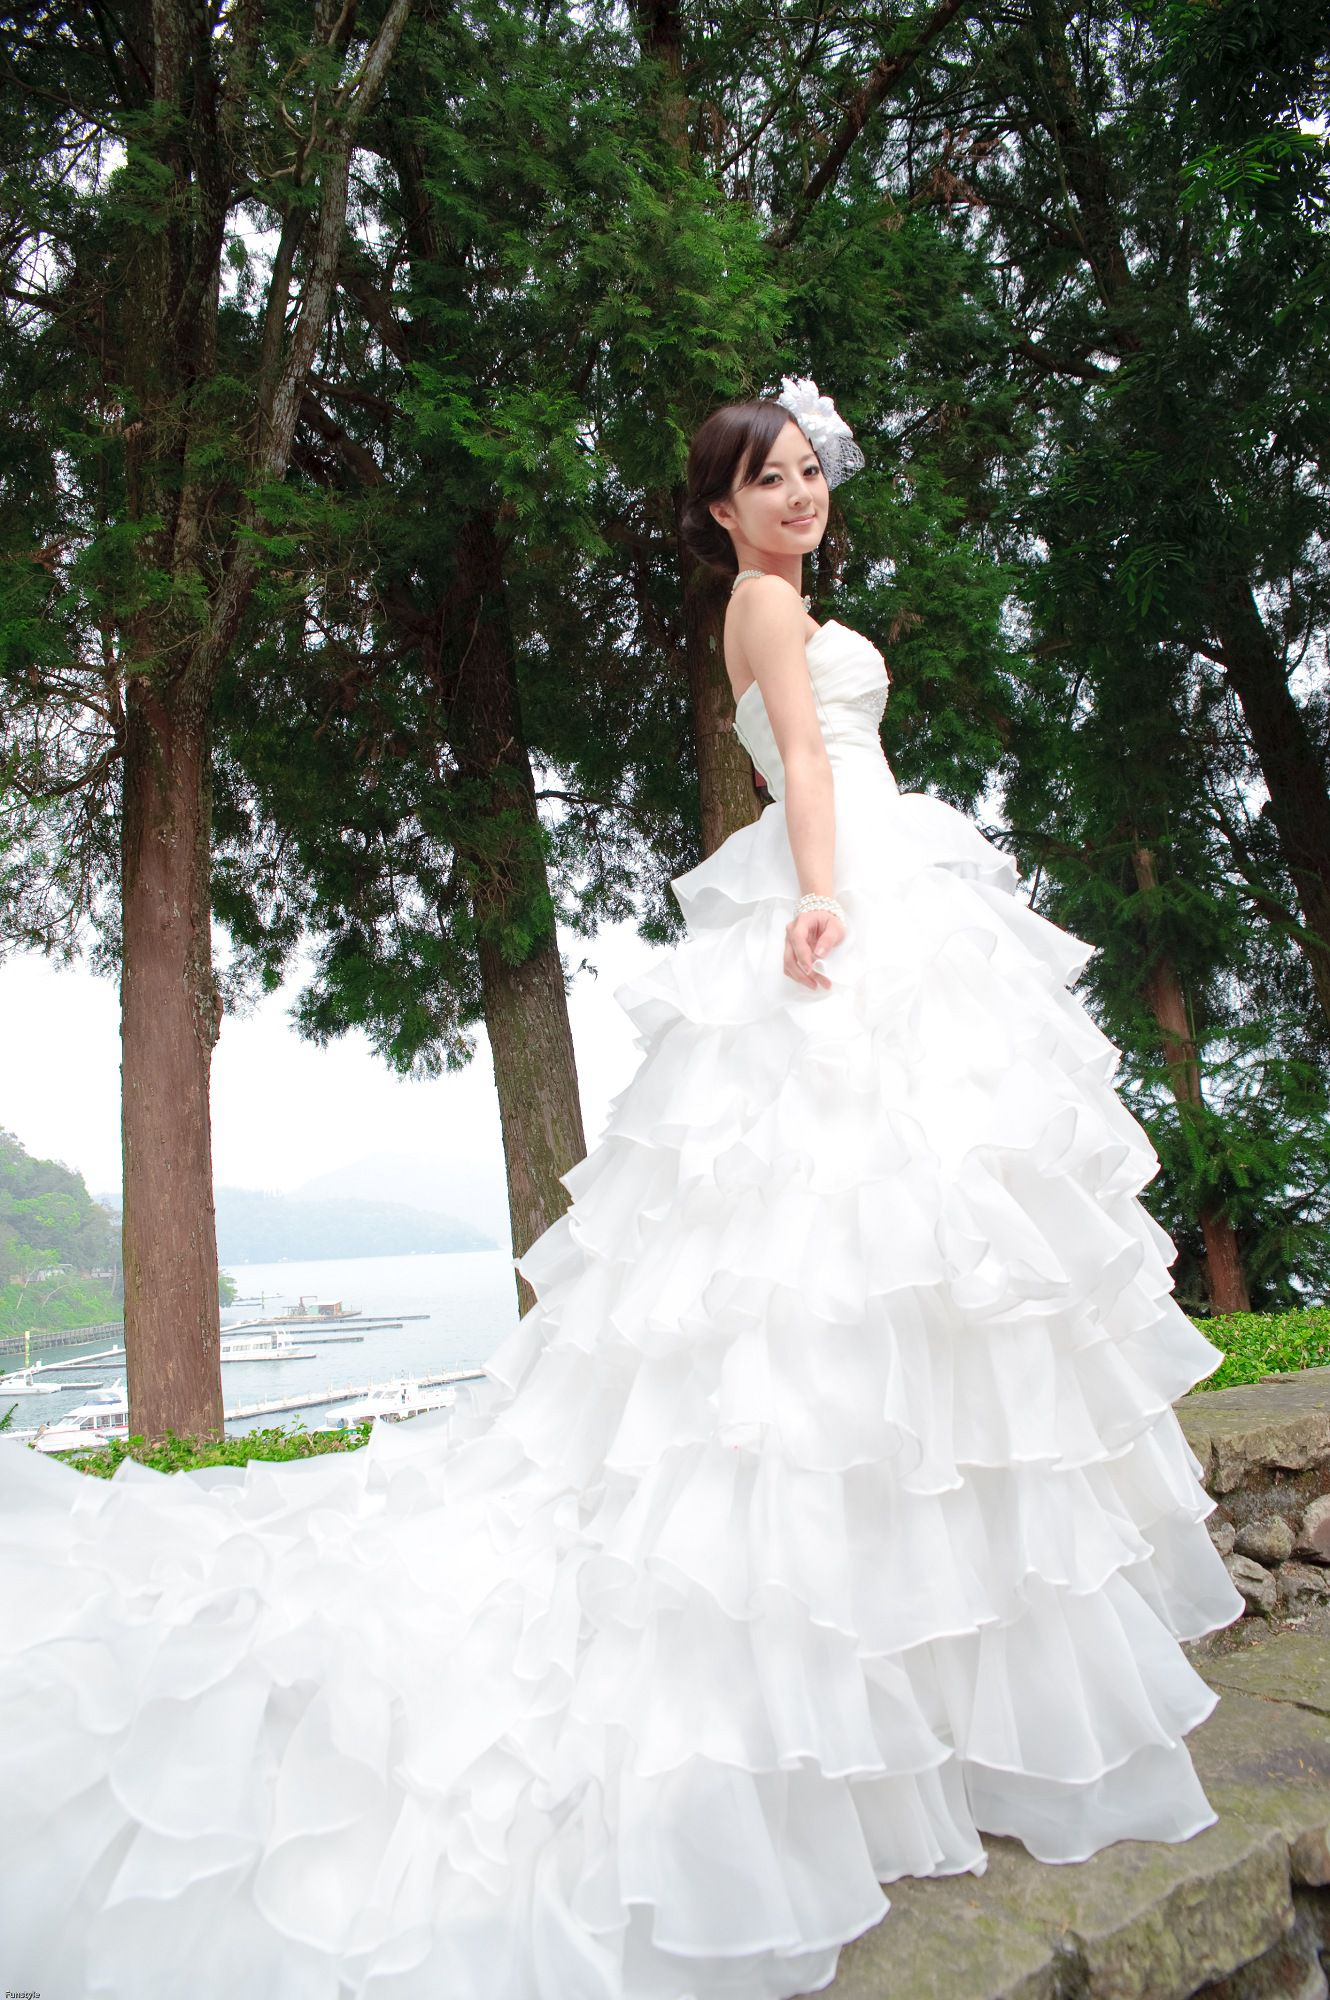 VOL.364 [台湾正妹]极品清新唯美女神婚纱:张凯洁(张允霏,果子MM)高品质写真套图(50P)